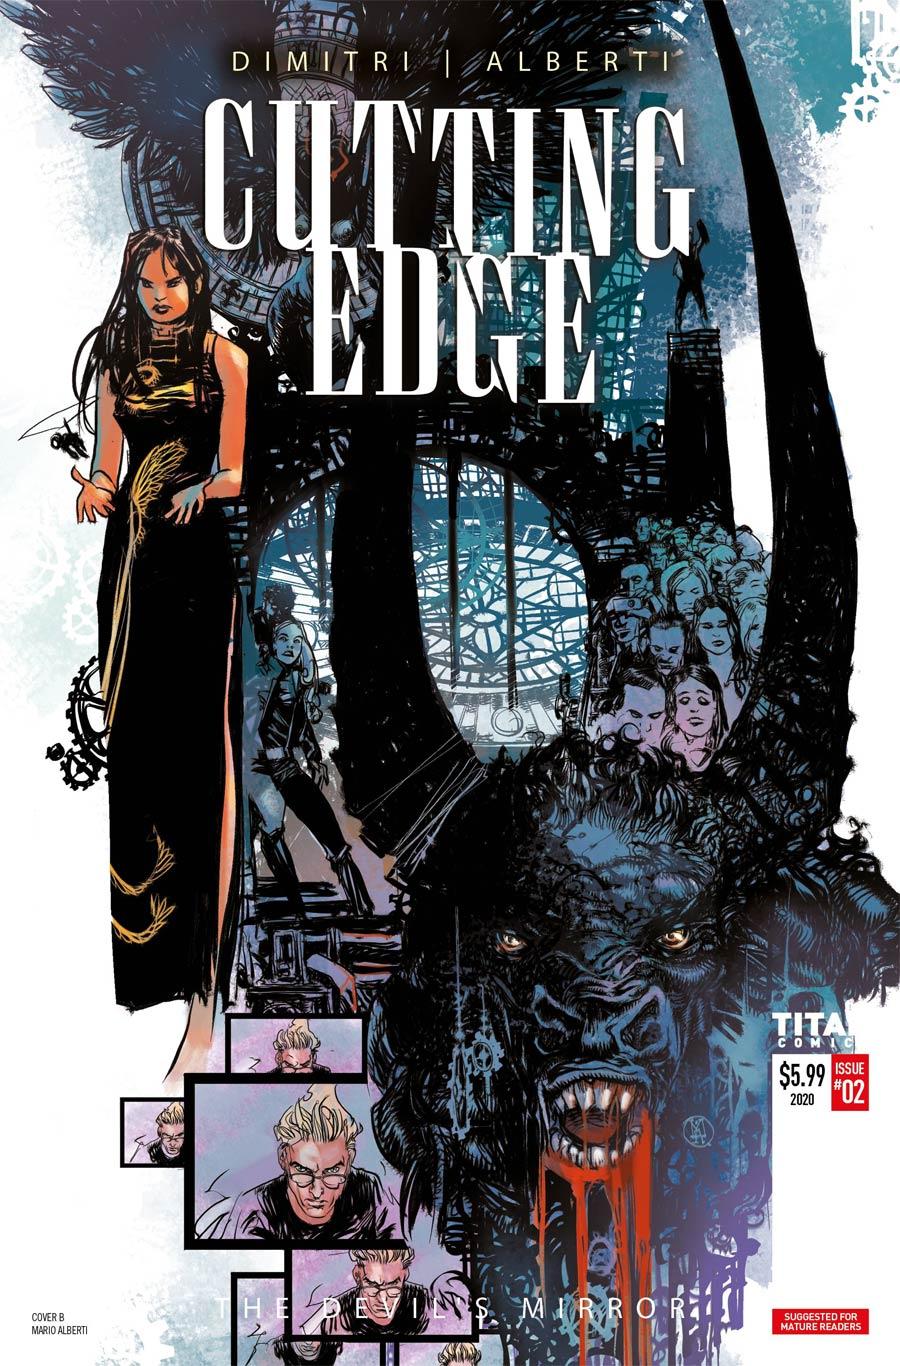 Cutting Edge Devils Mirror #2 Cover B Variant Mario Alberti Cover